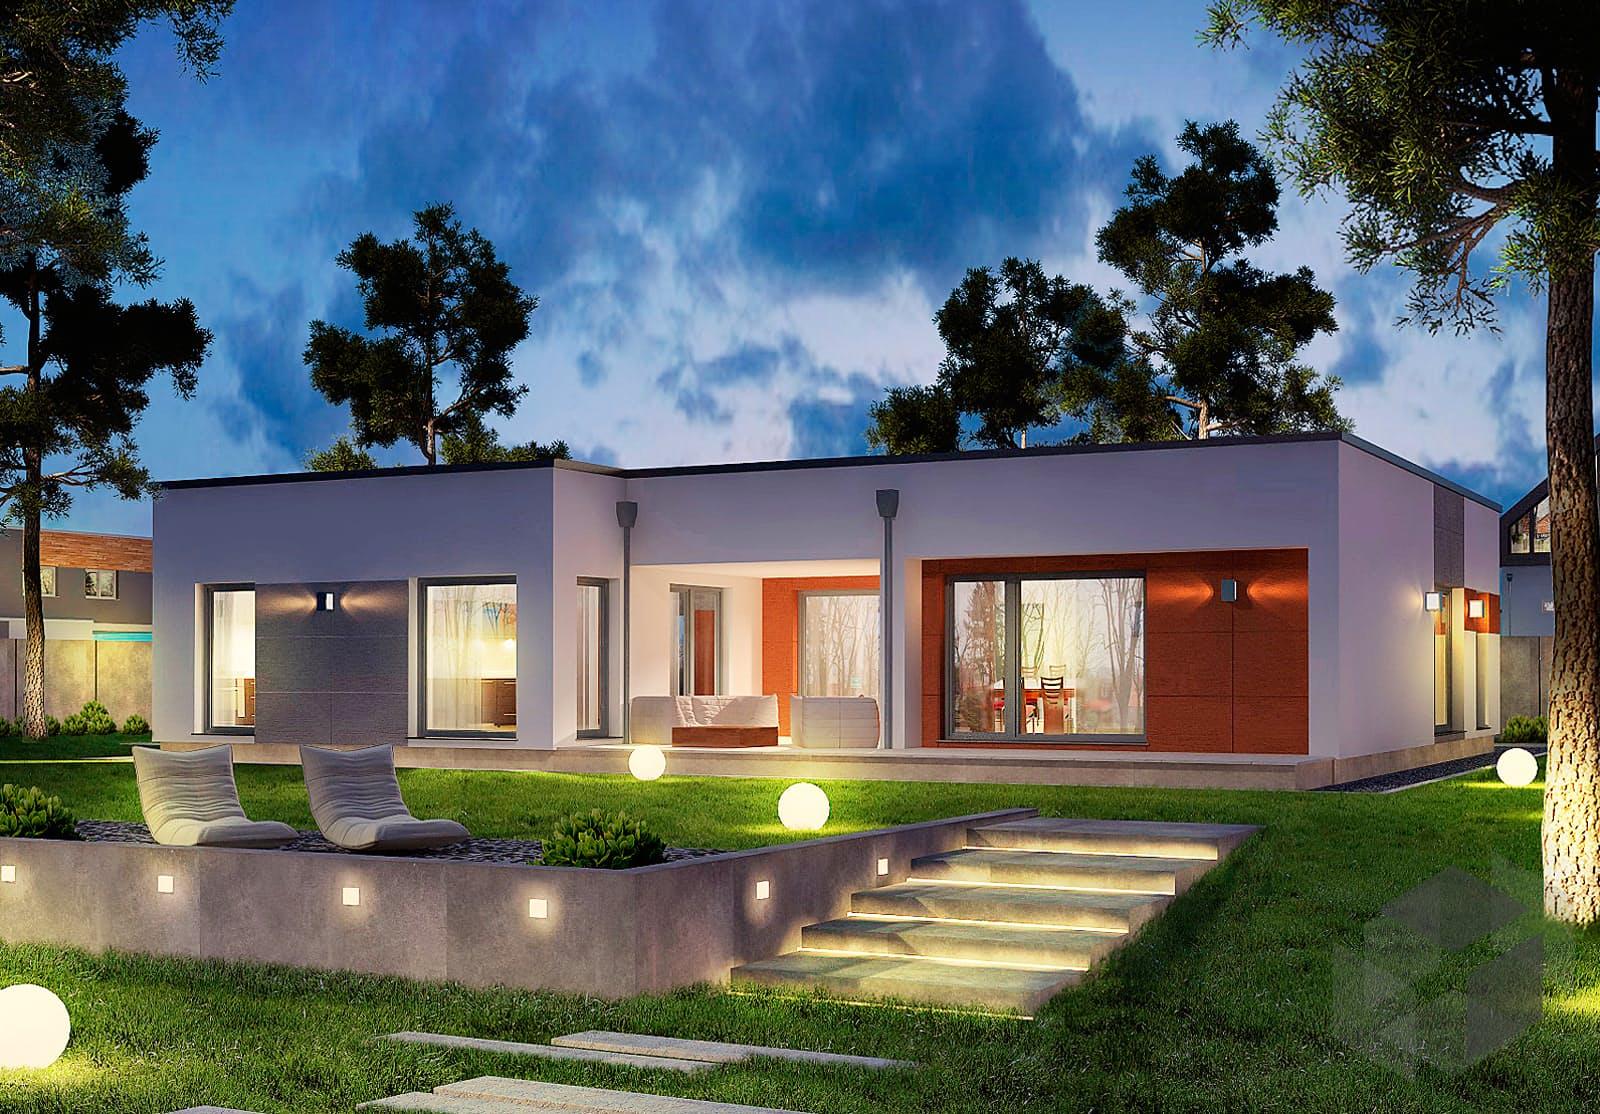 perfect 149 cube von dan wood komplette daten bersicht. Black Bedroom Furniture Sets. Home Design Ideas